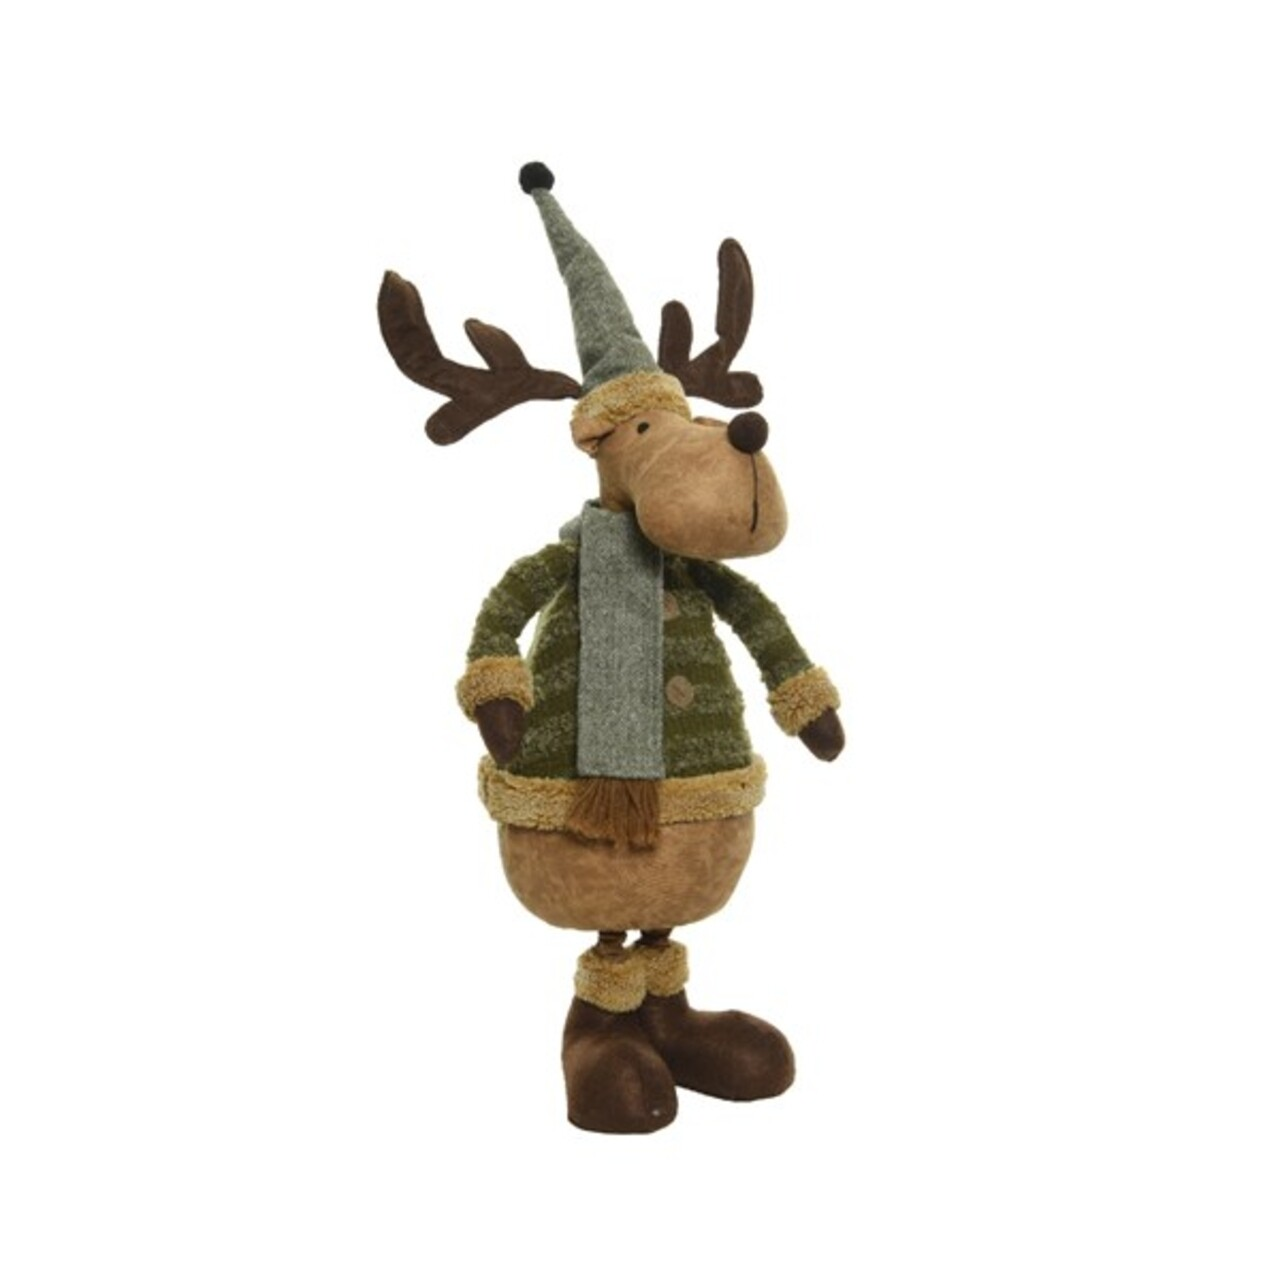 Decoratiune Deer w hat w scarf, Decoris, 21x25x87 cm, poliester, maro